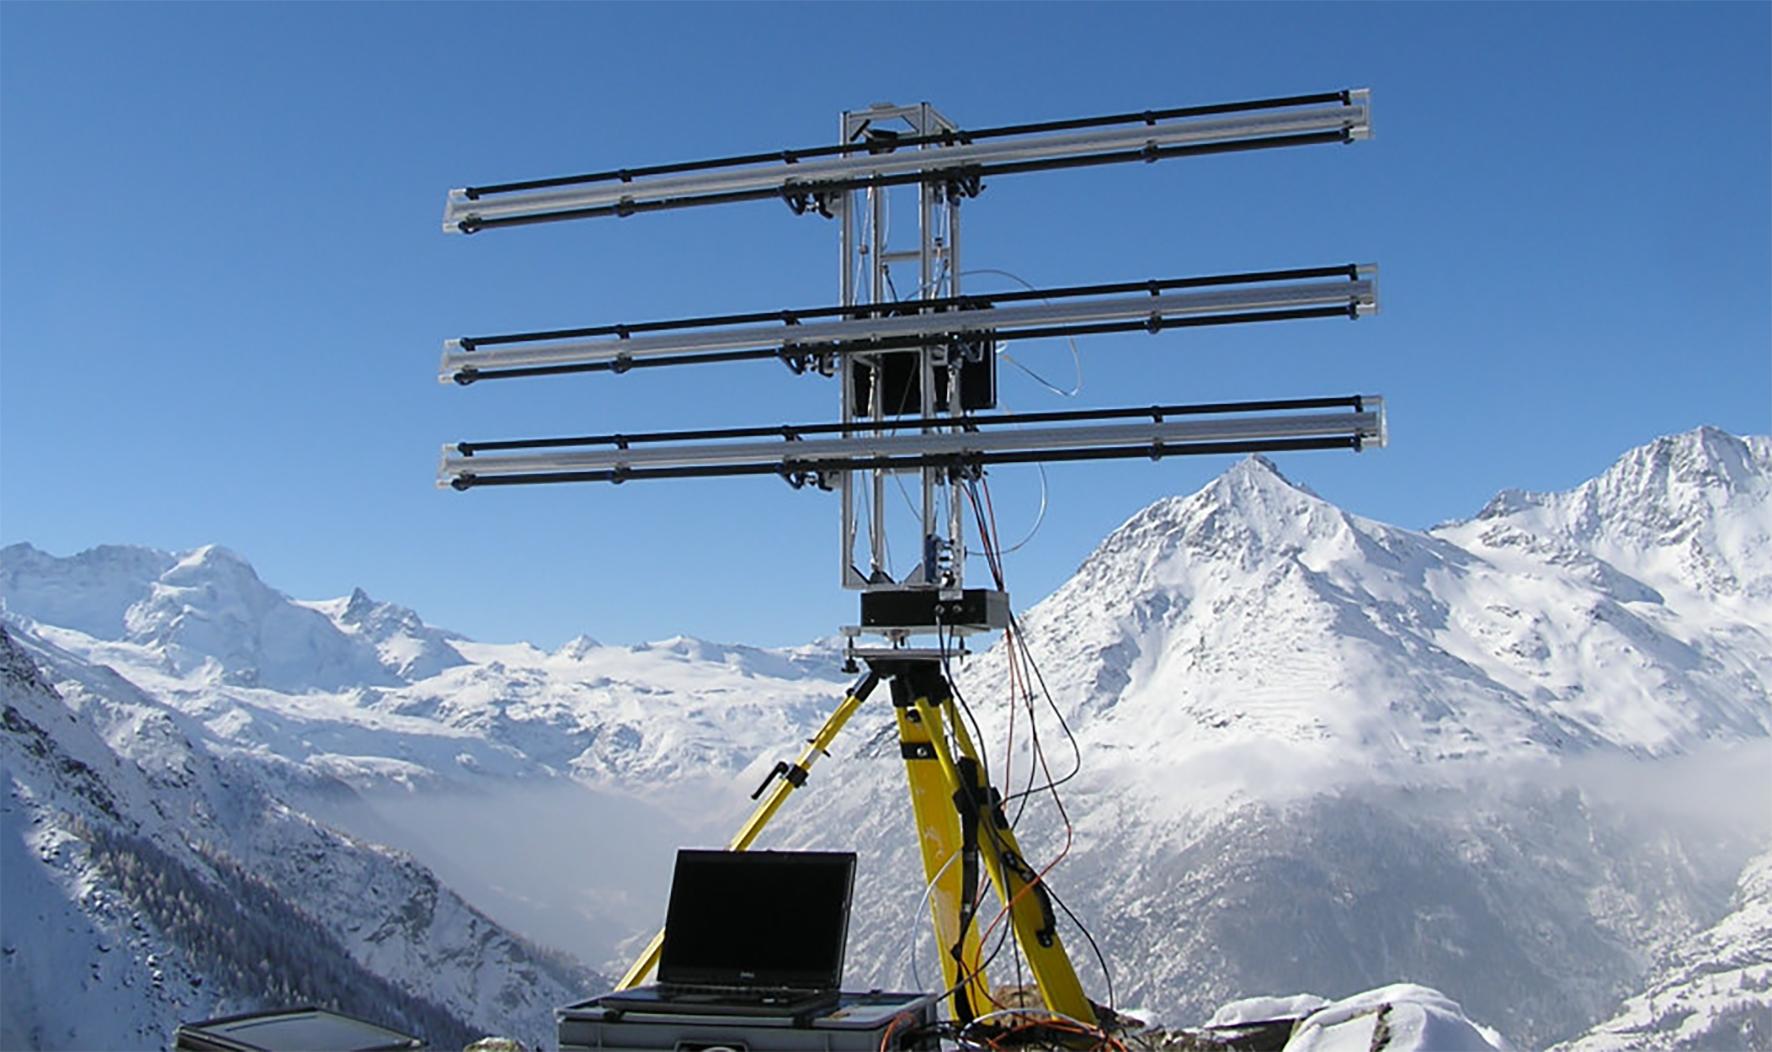 GAMMA - Gamma Remote Sensing